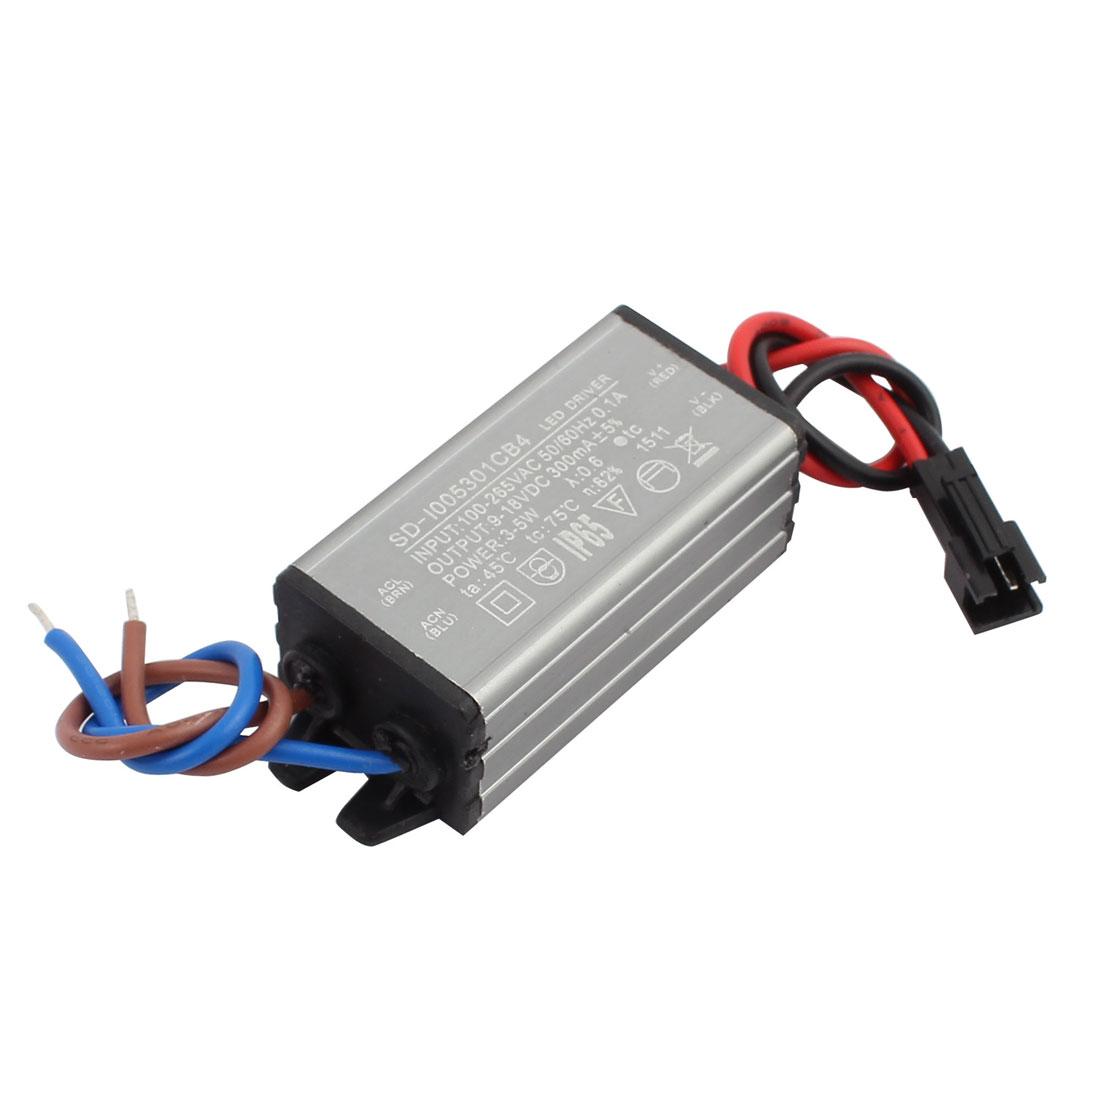 AC100-265V to DC9-18V 3-5W Transformer IP65 Waterproof LED Driver Power Supply